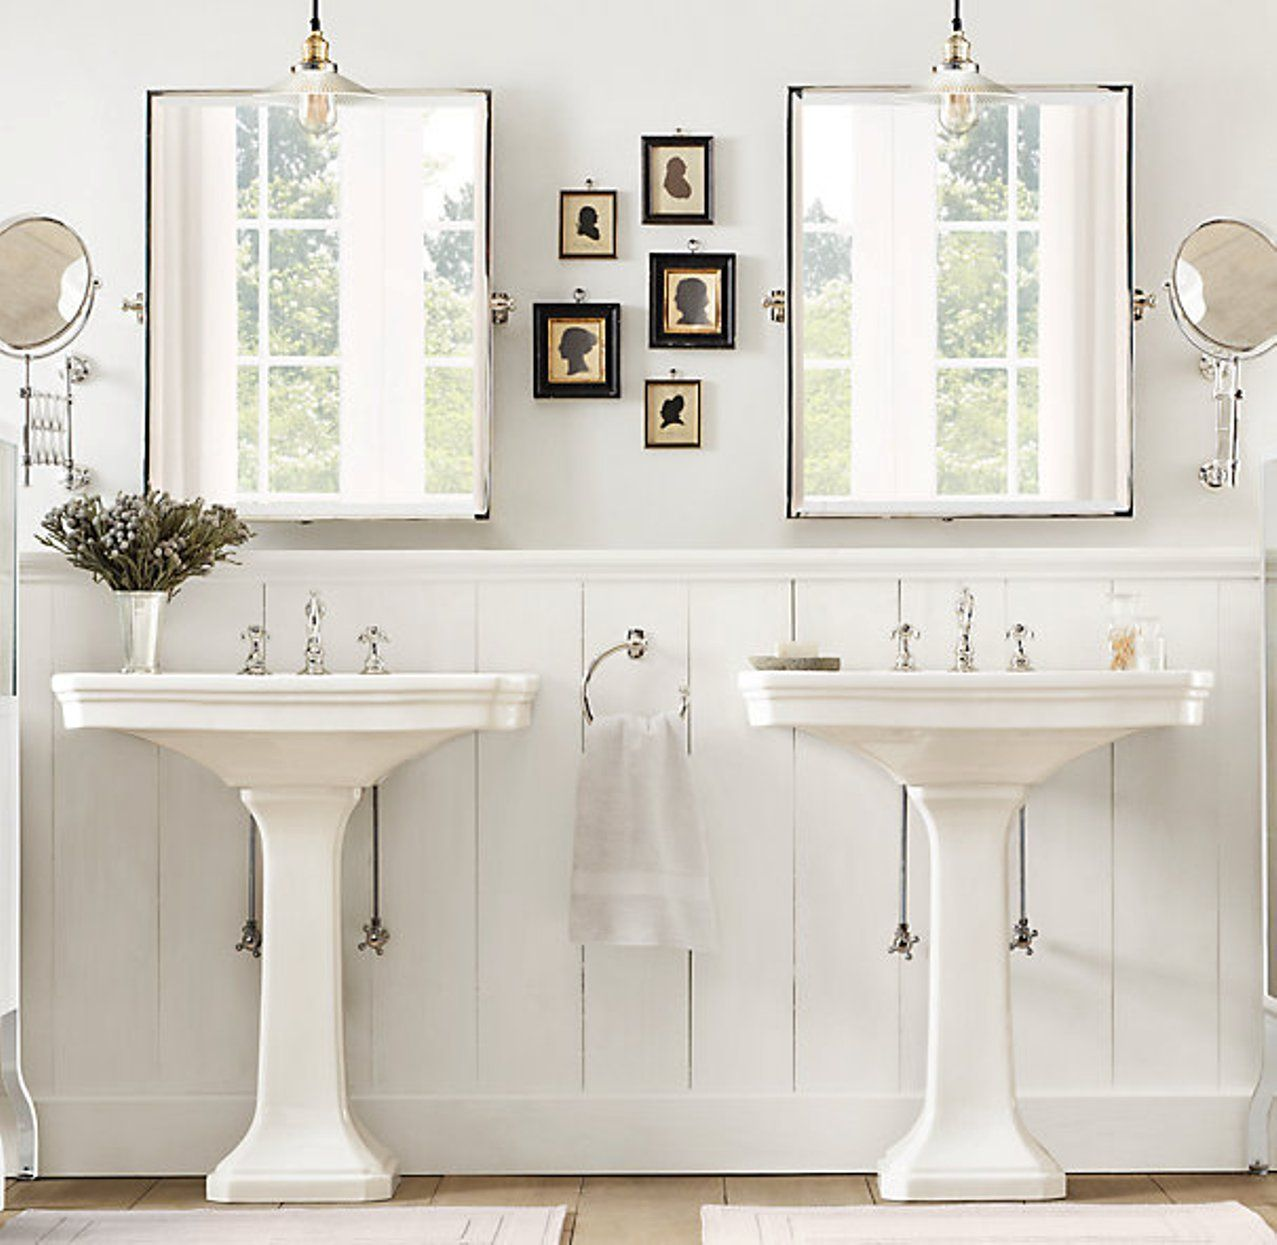 Restoration hardware bathroom lighting - Estoration Hardware Bathroom Lighting Ideas Gemslife Com